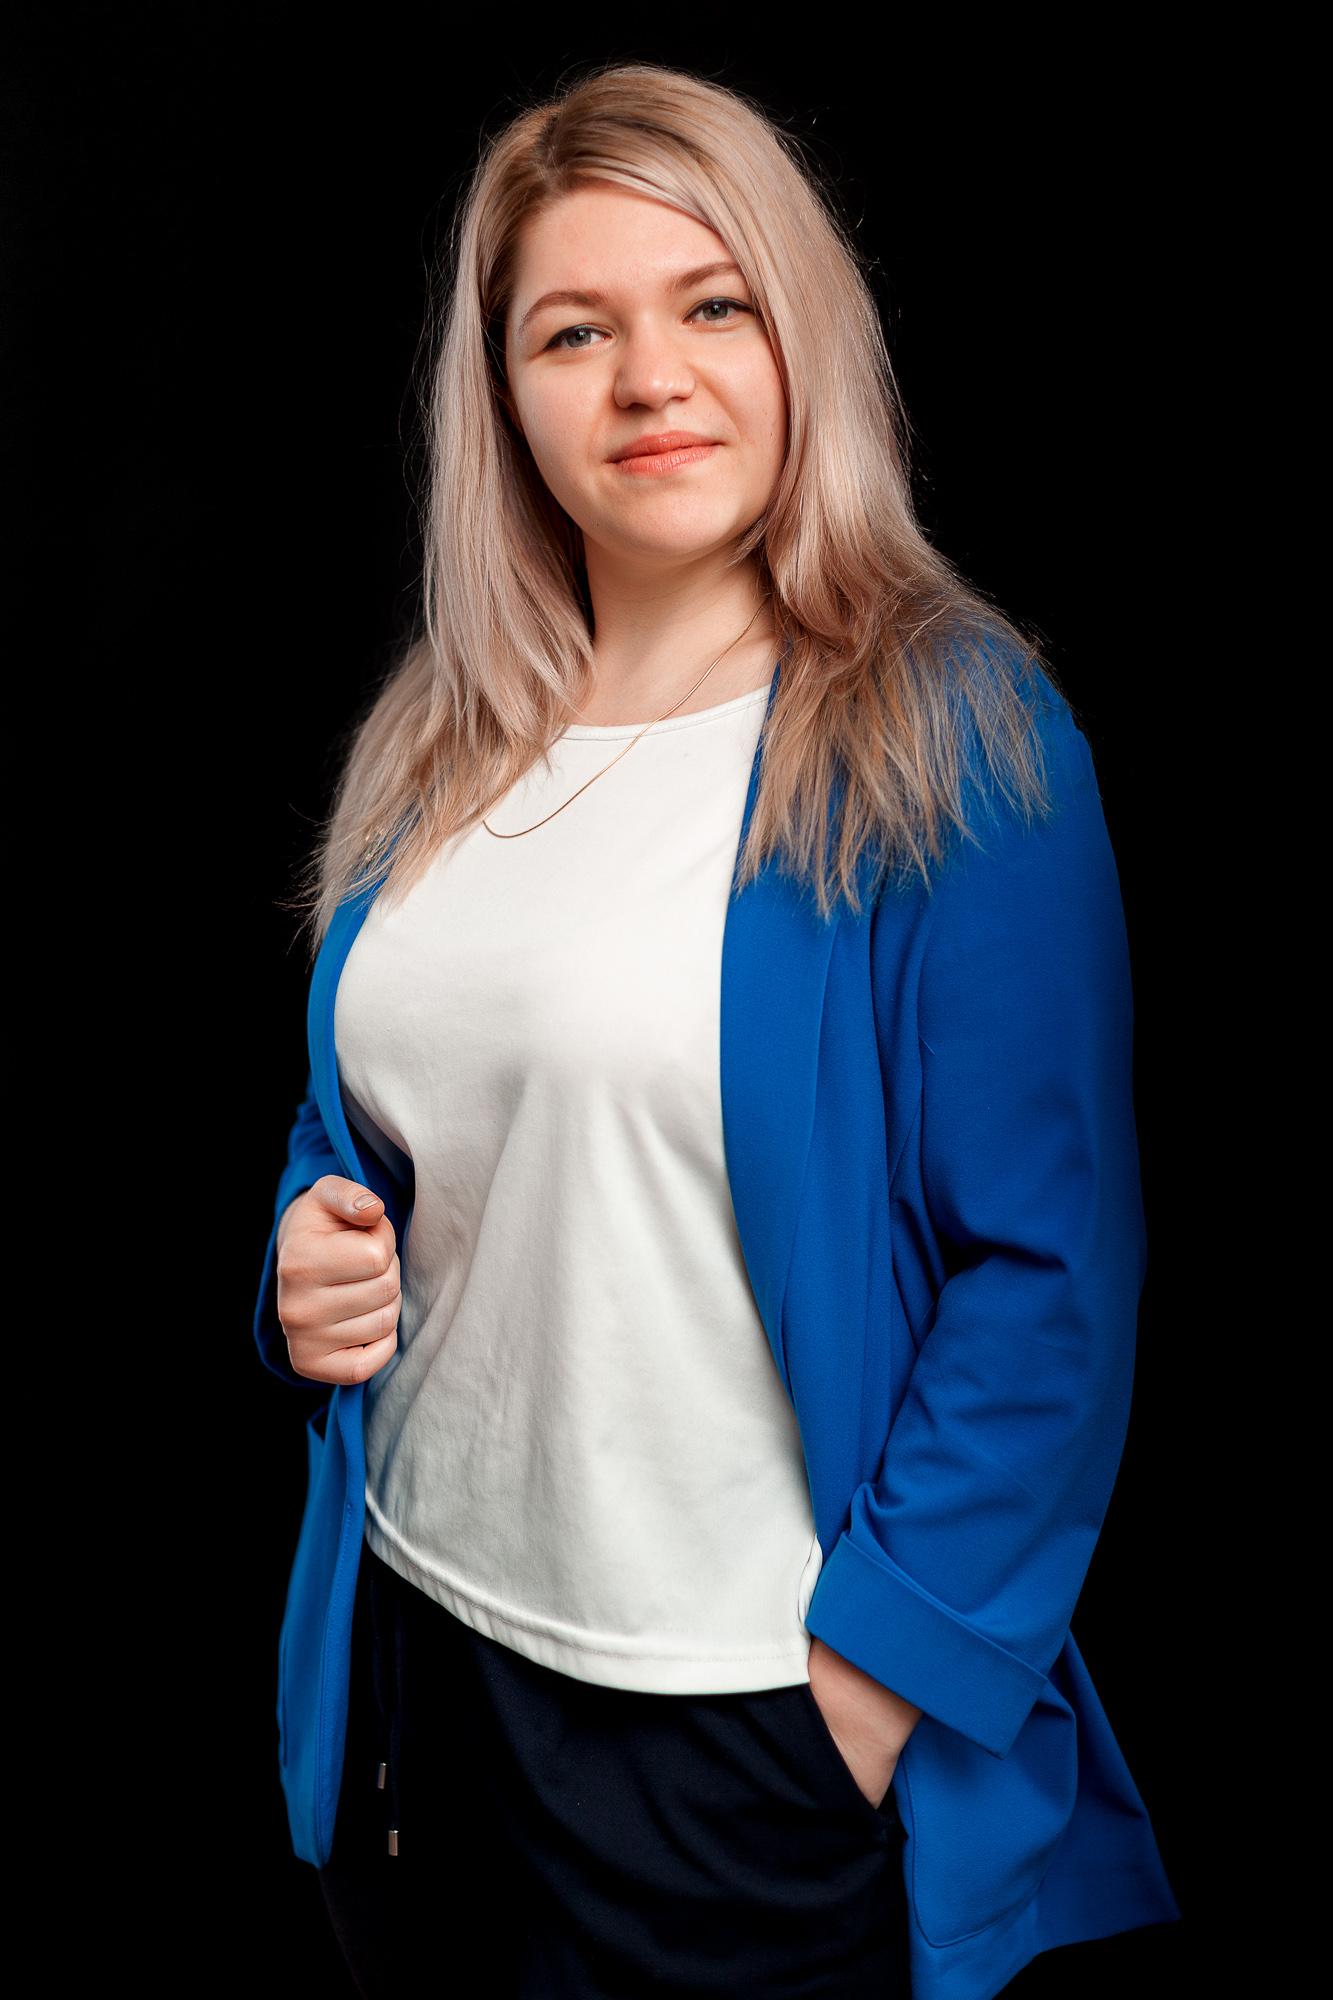 Королева Анастасия Михайловна